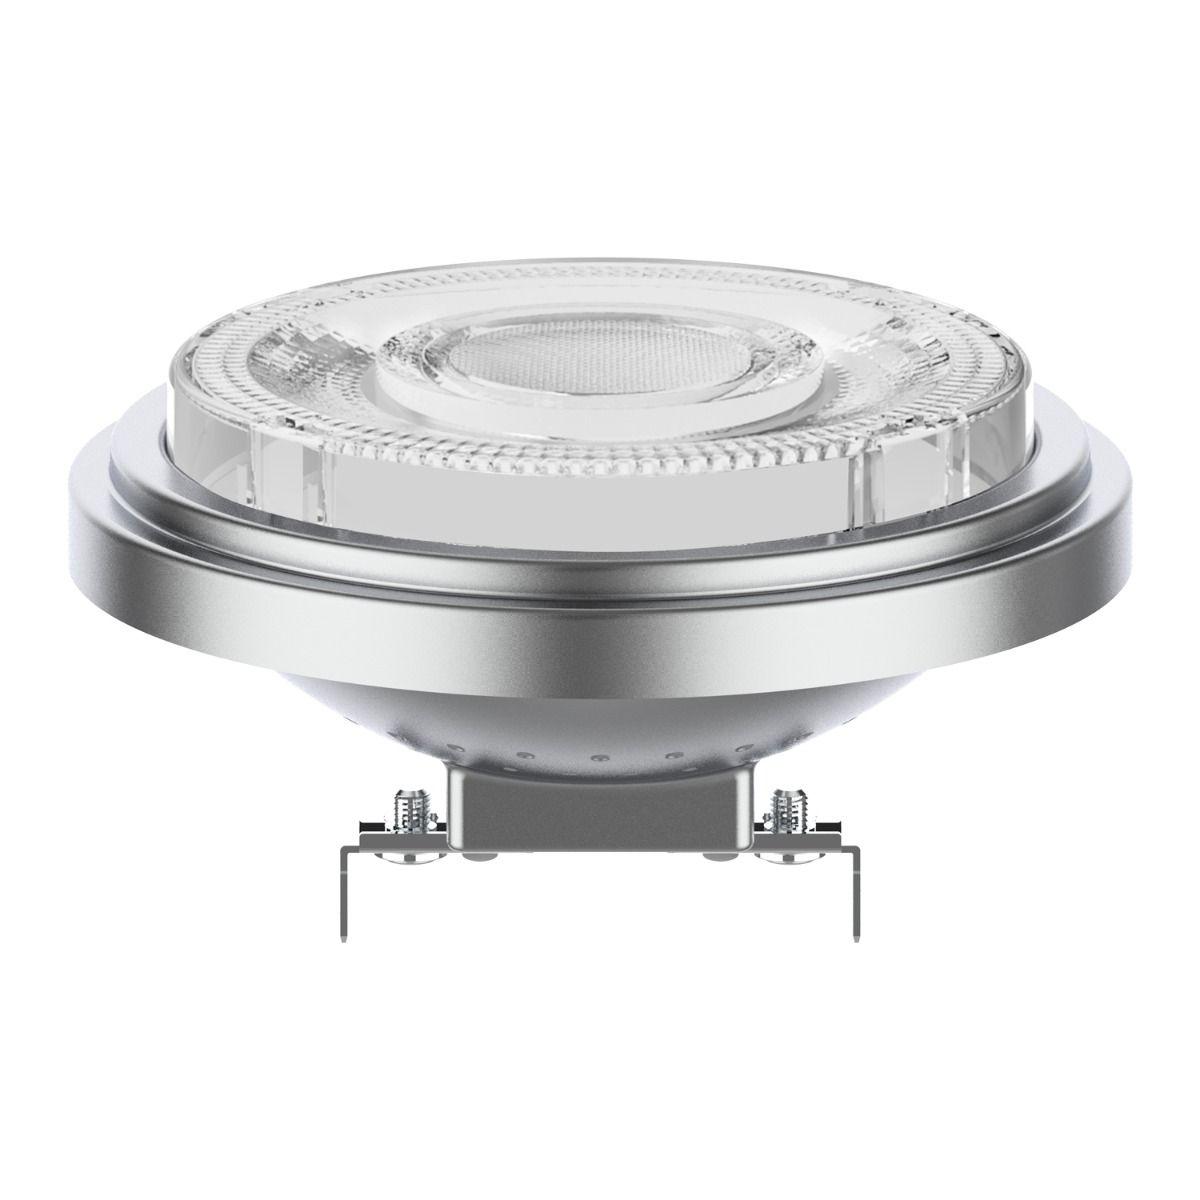 Noxion Lucent LED Spot AR111 G53 12V 7.3W 930 24D | Dimbaar - Hoogste Kleurweergave - Vervanger voor 50W